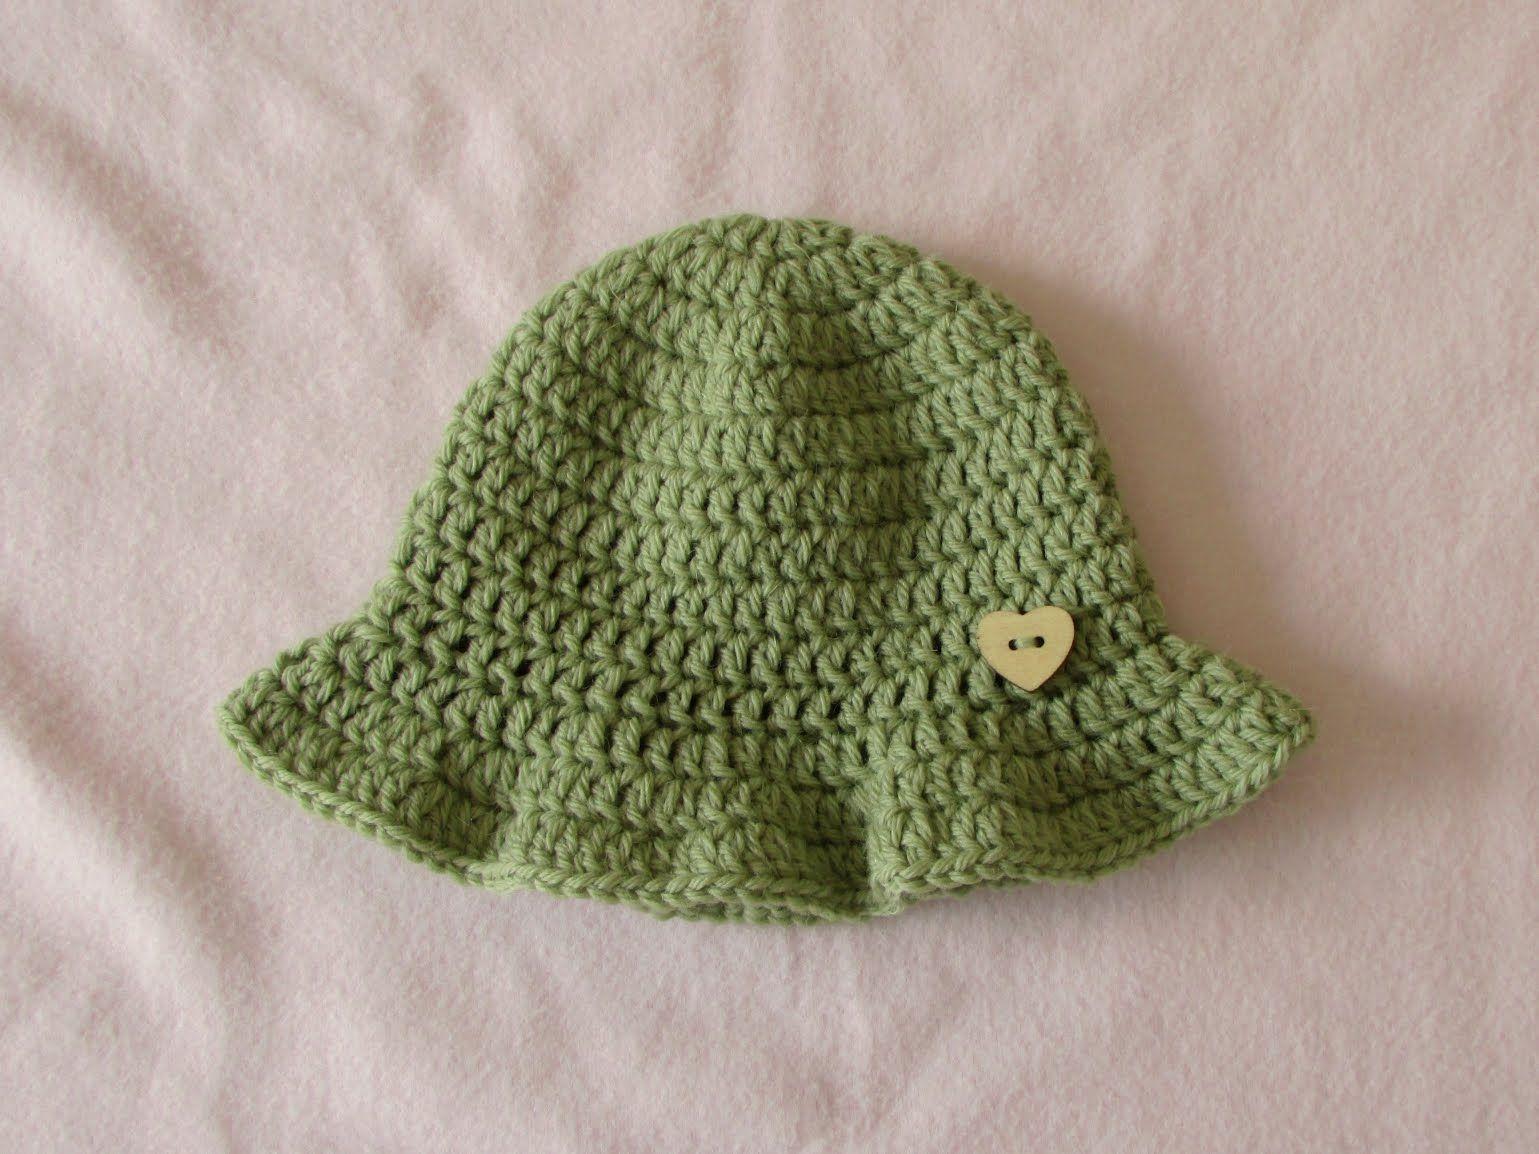 VERY EASY simple crochet baby sun hat tutorial - summer baby hat - YouTube 4a72b60e565